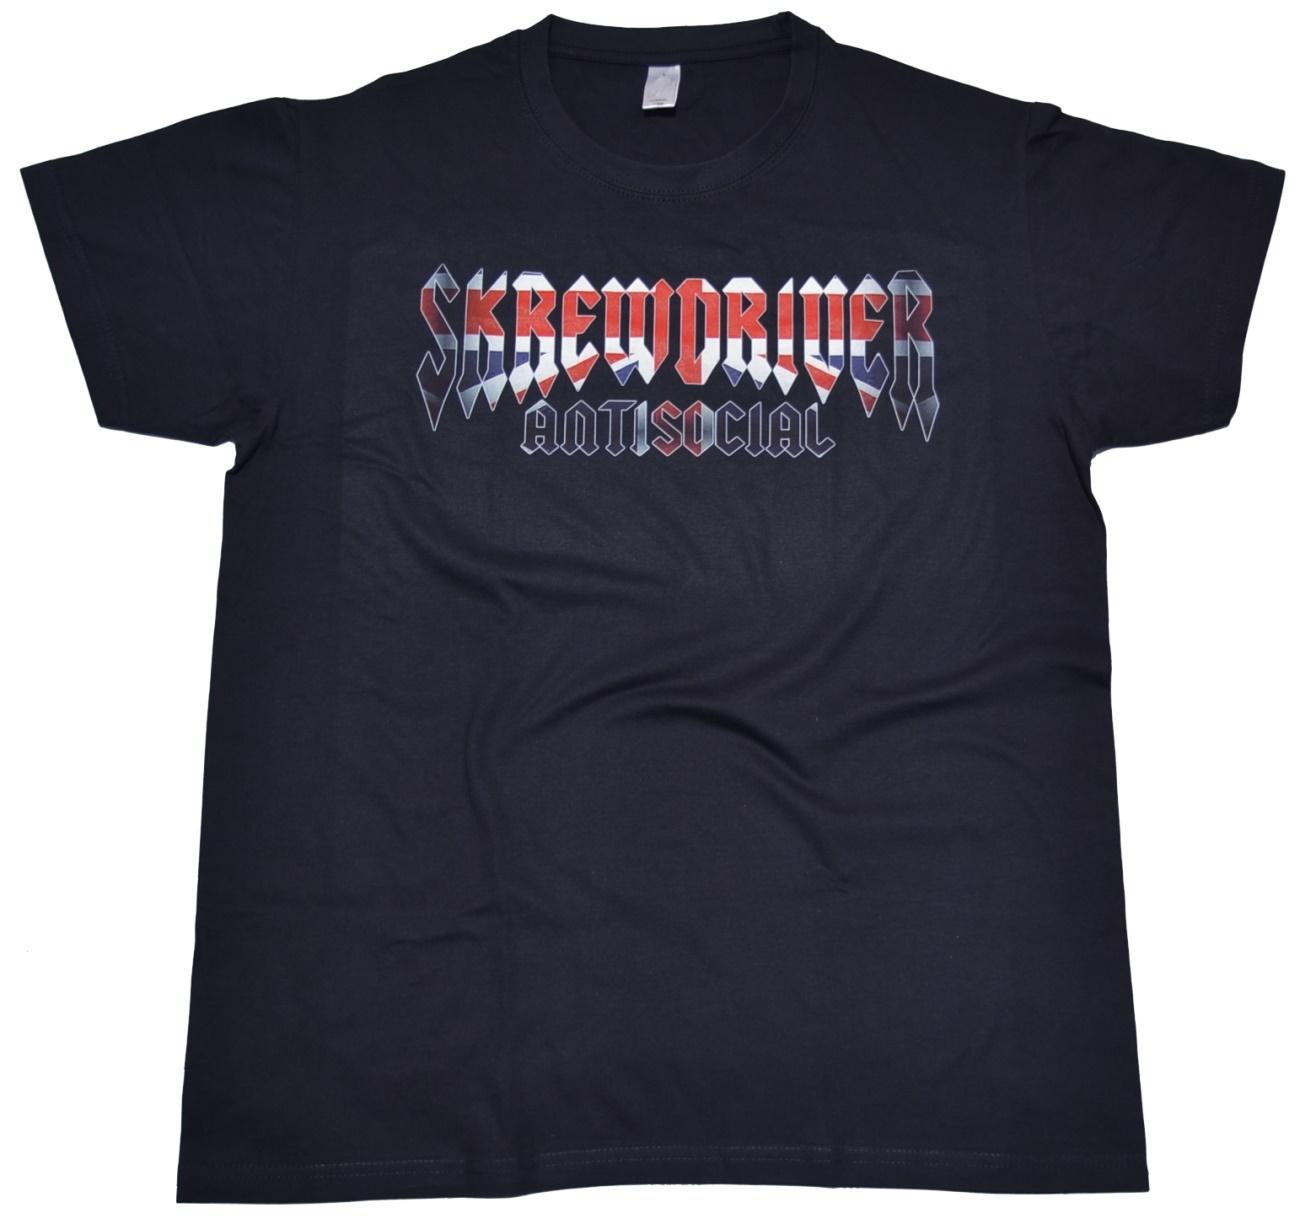 T-Shirt Skrewdriver Antisocial - Skinhead Shop T-Shirts ...